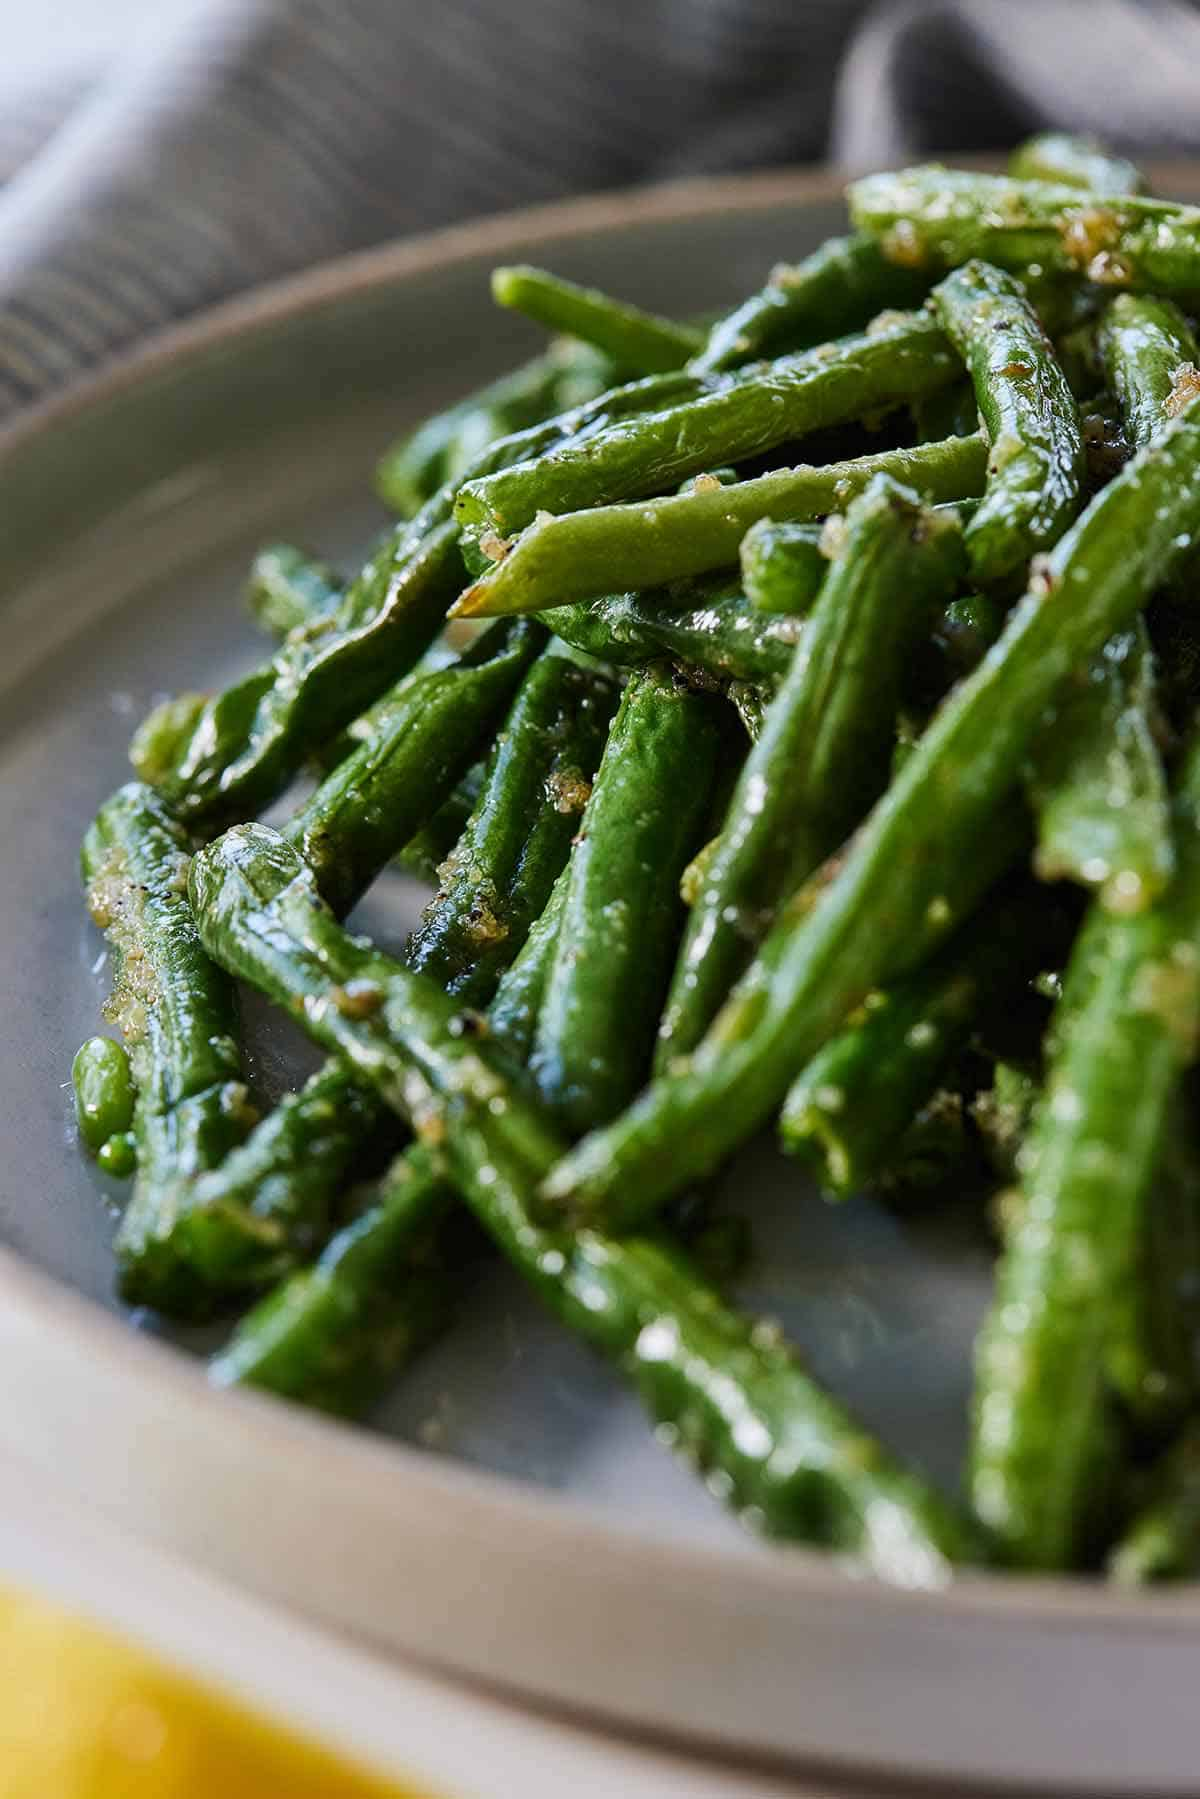 Air fryer green beans in a shallow plate.